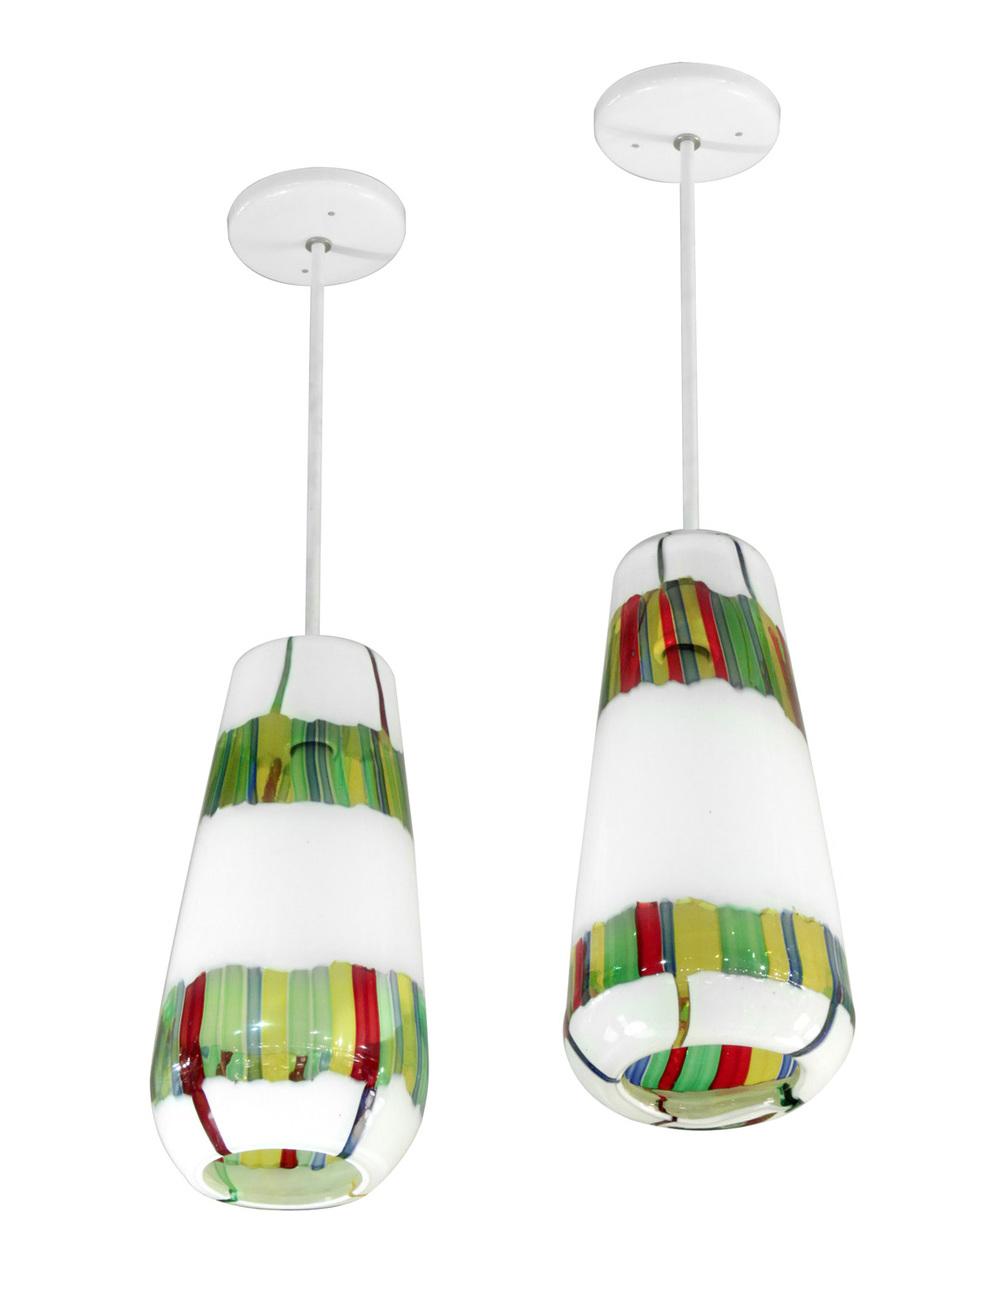 Fuga 200 pr Bandiere pendants chandelier210 hires.jpg